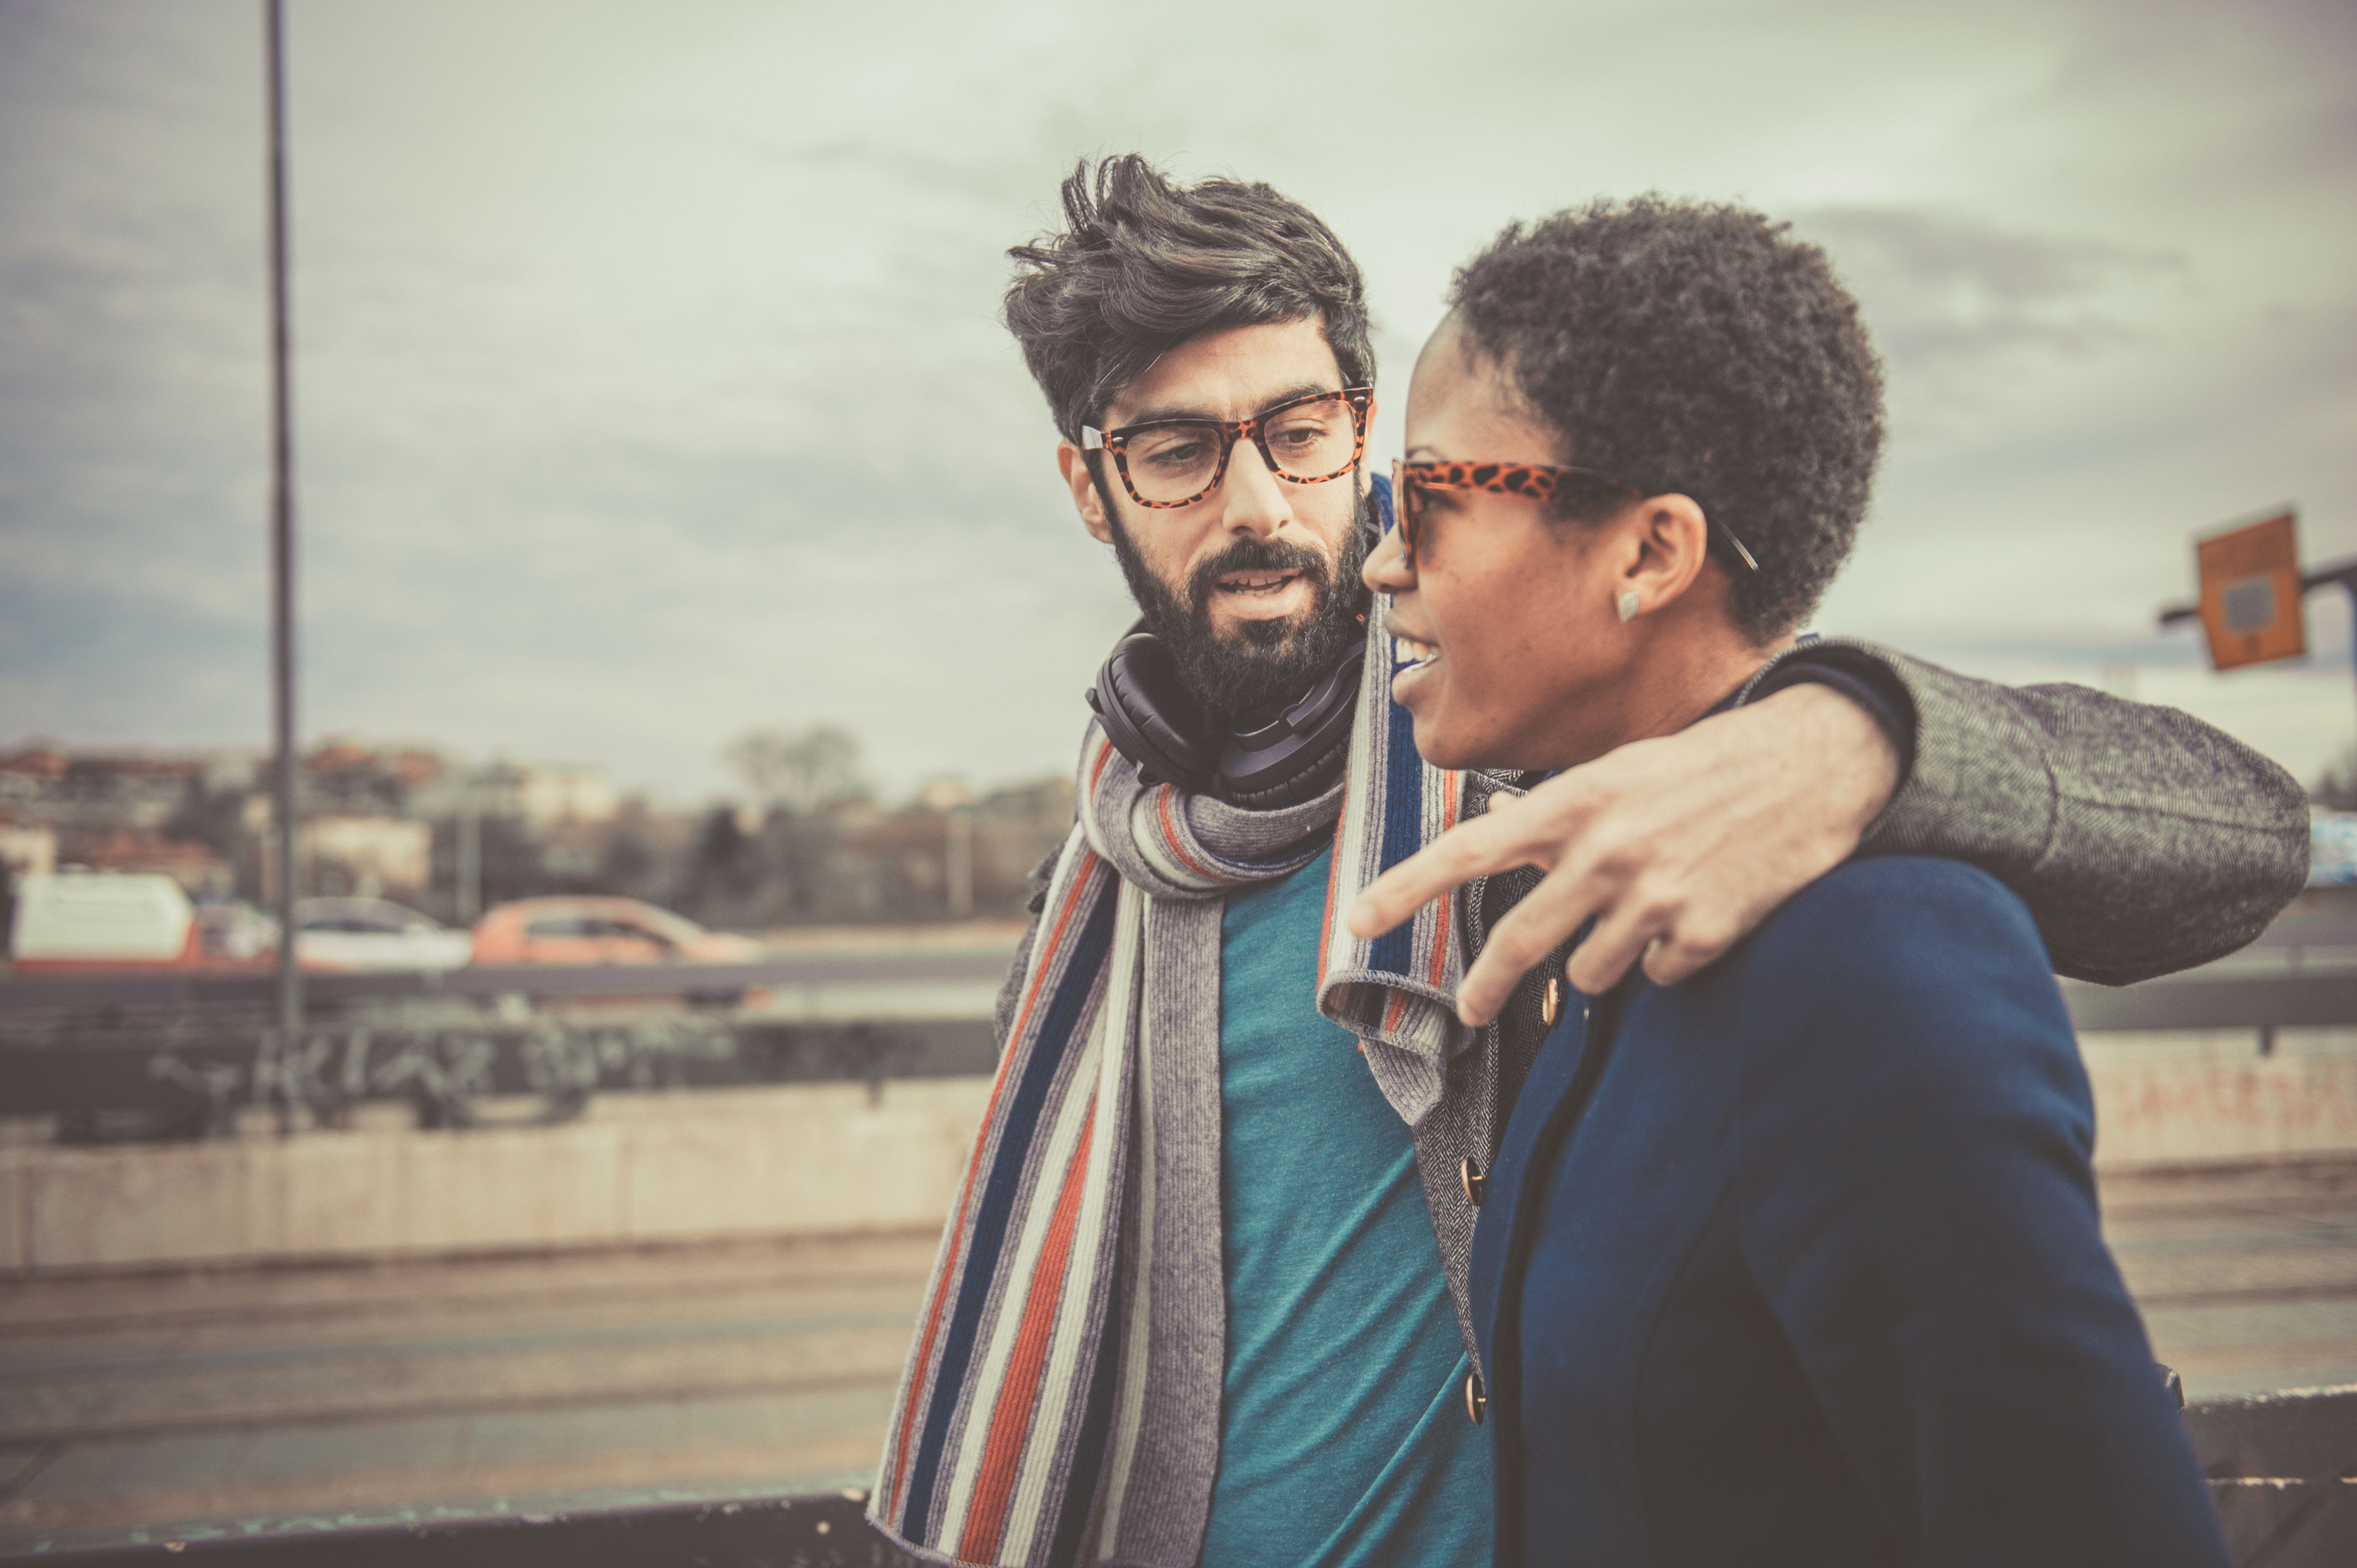 Interracial couples and prejudice